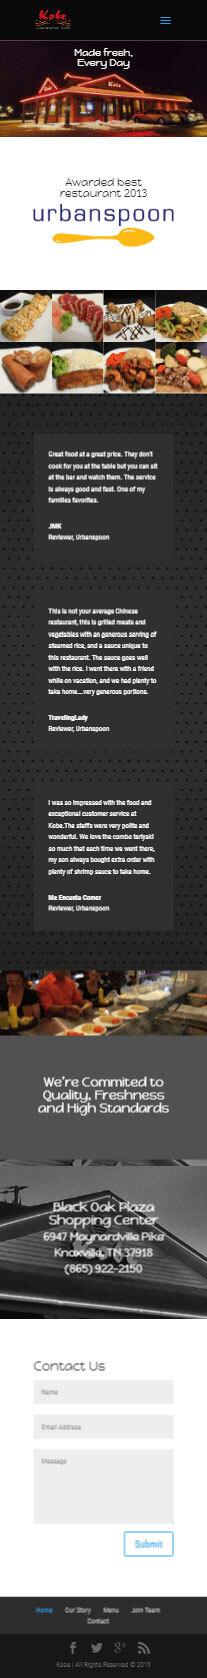 Portfolio - Web Design | Knoxweb